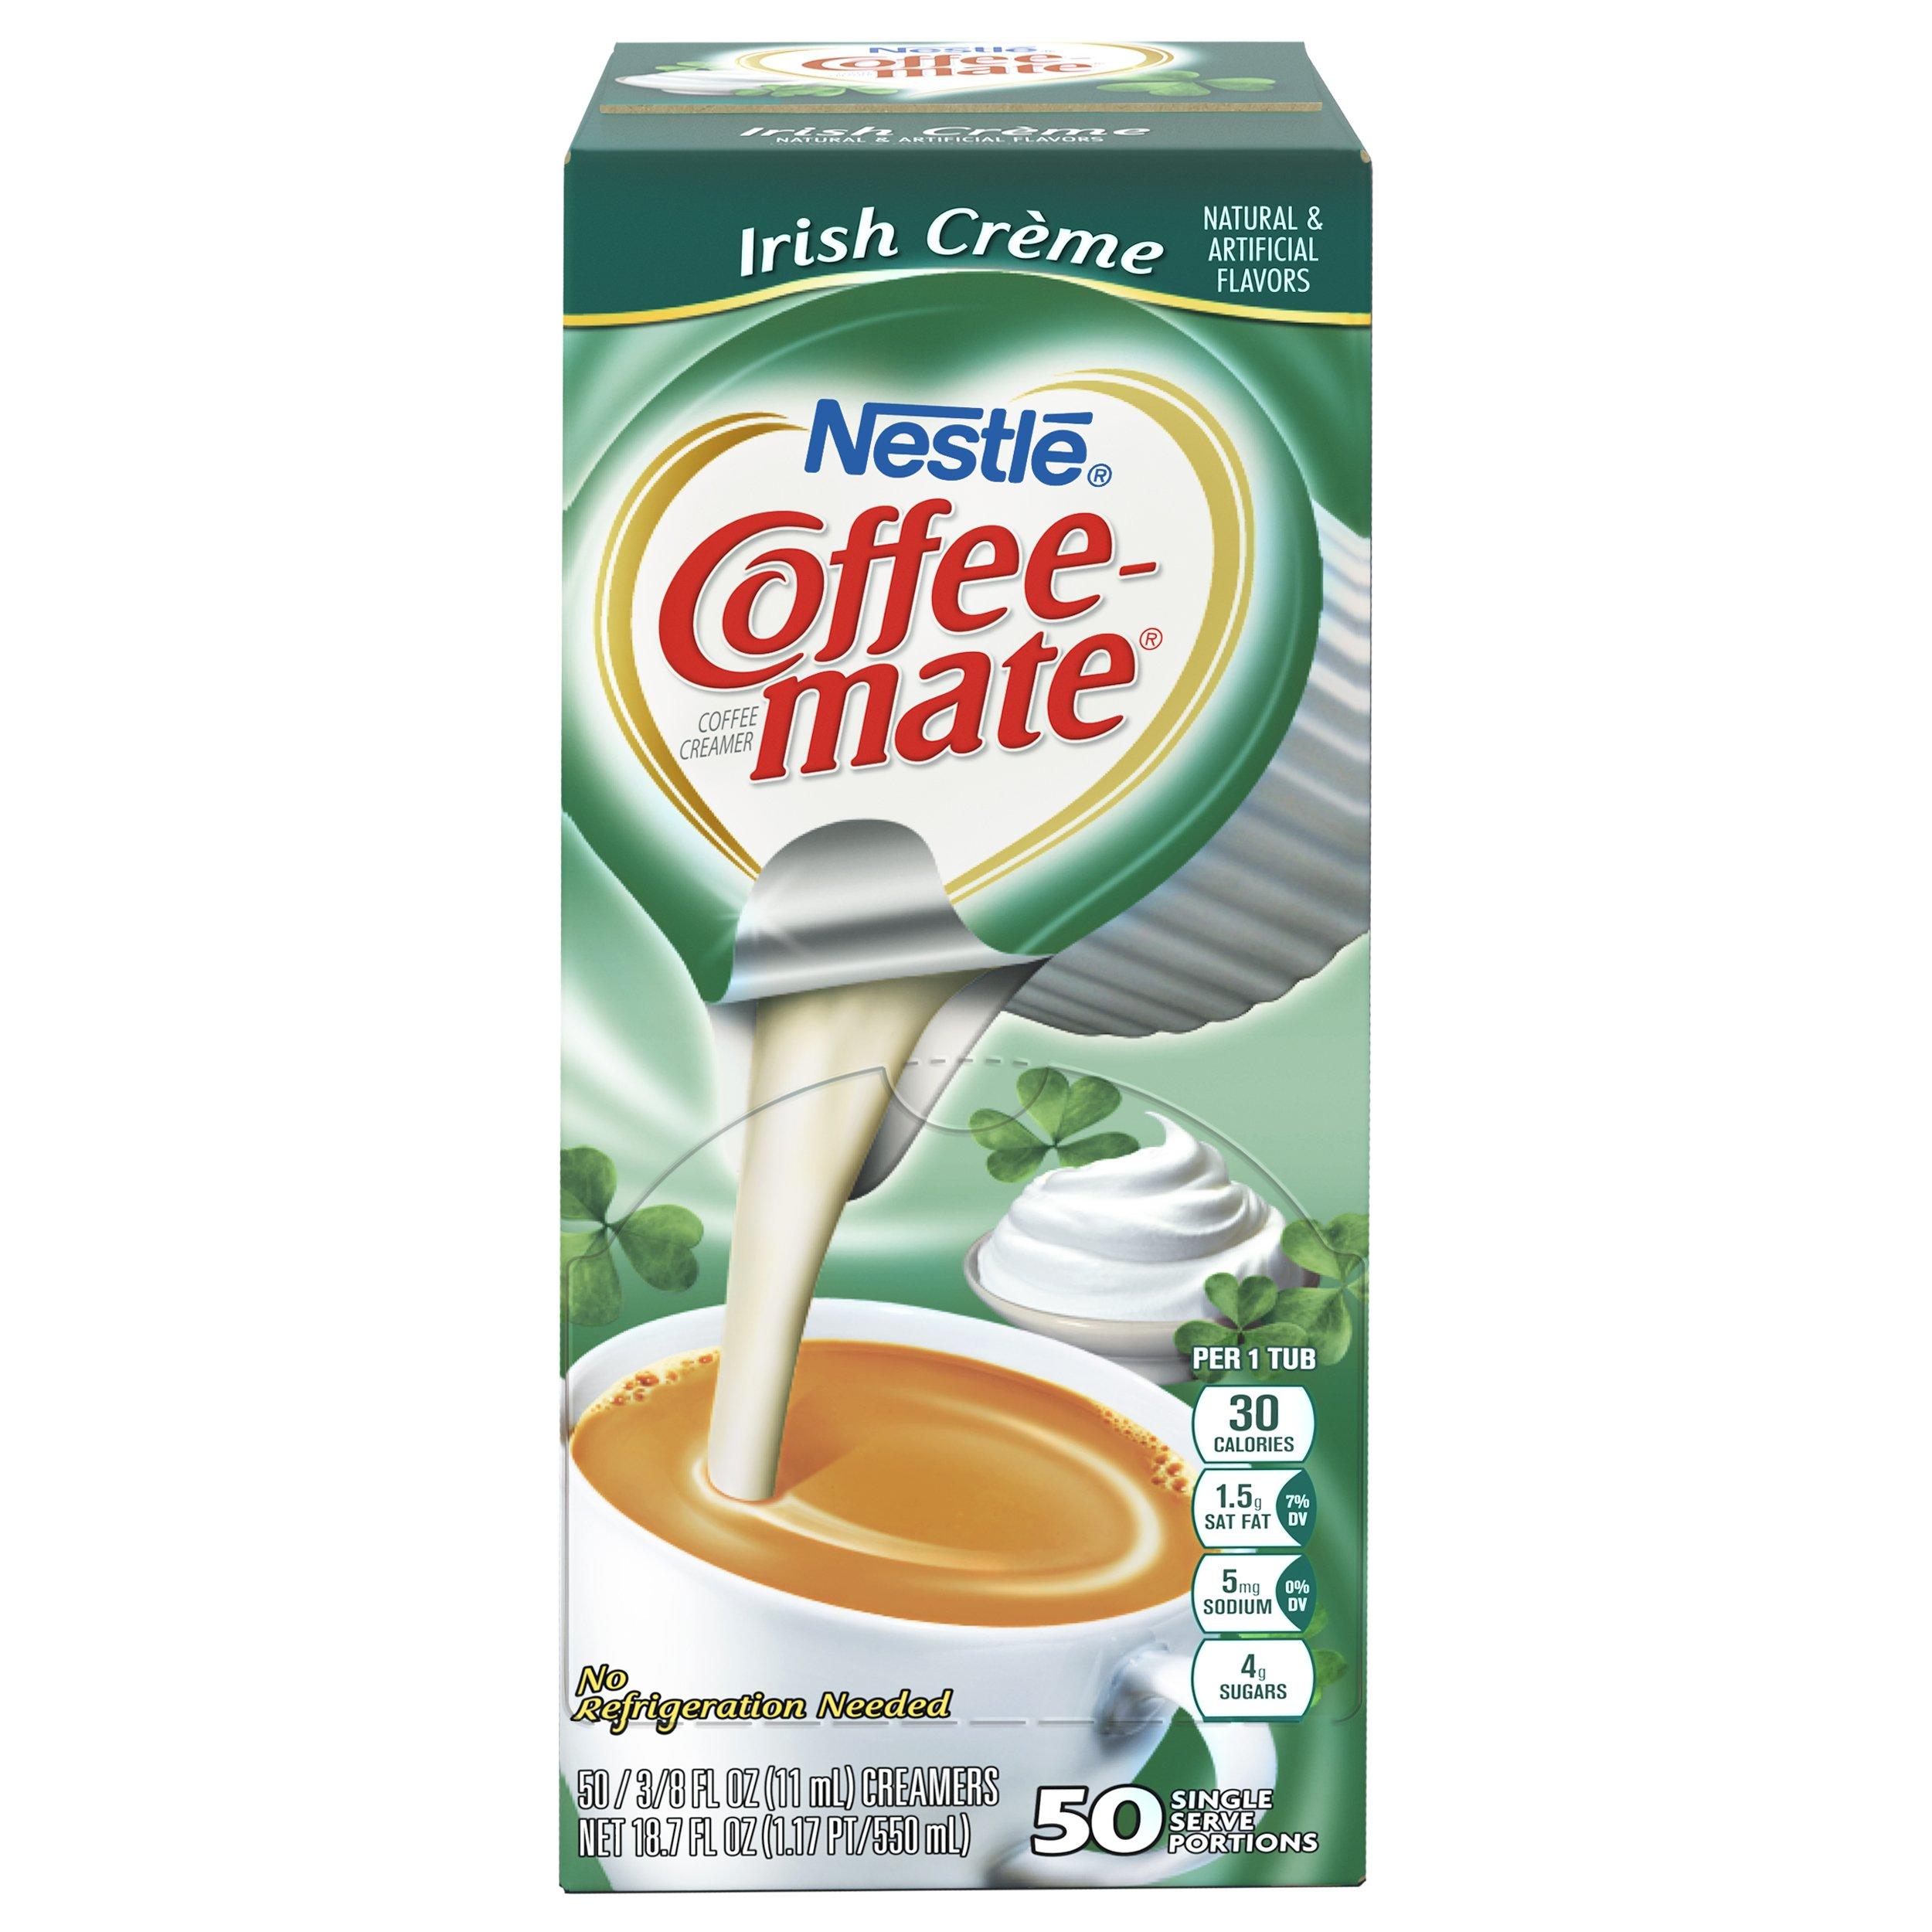 NESTLE COFFEE-MATE Coffee Creamer, Irish Creme, liquid creamer singles, Pack of 200 by Nestle Coffee Mate (Image #2)